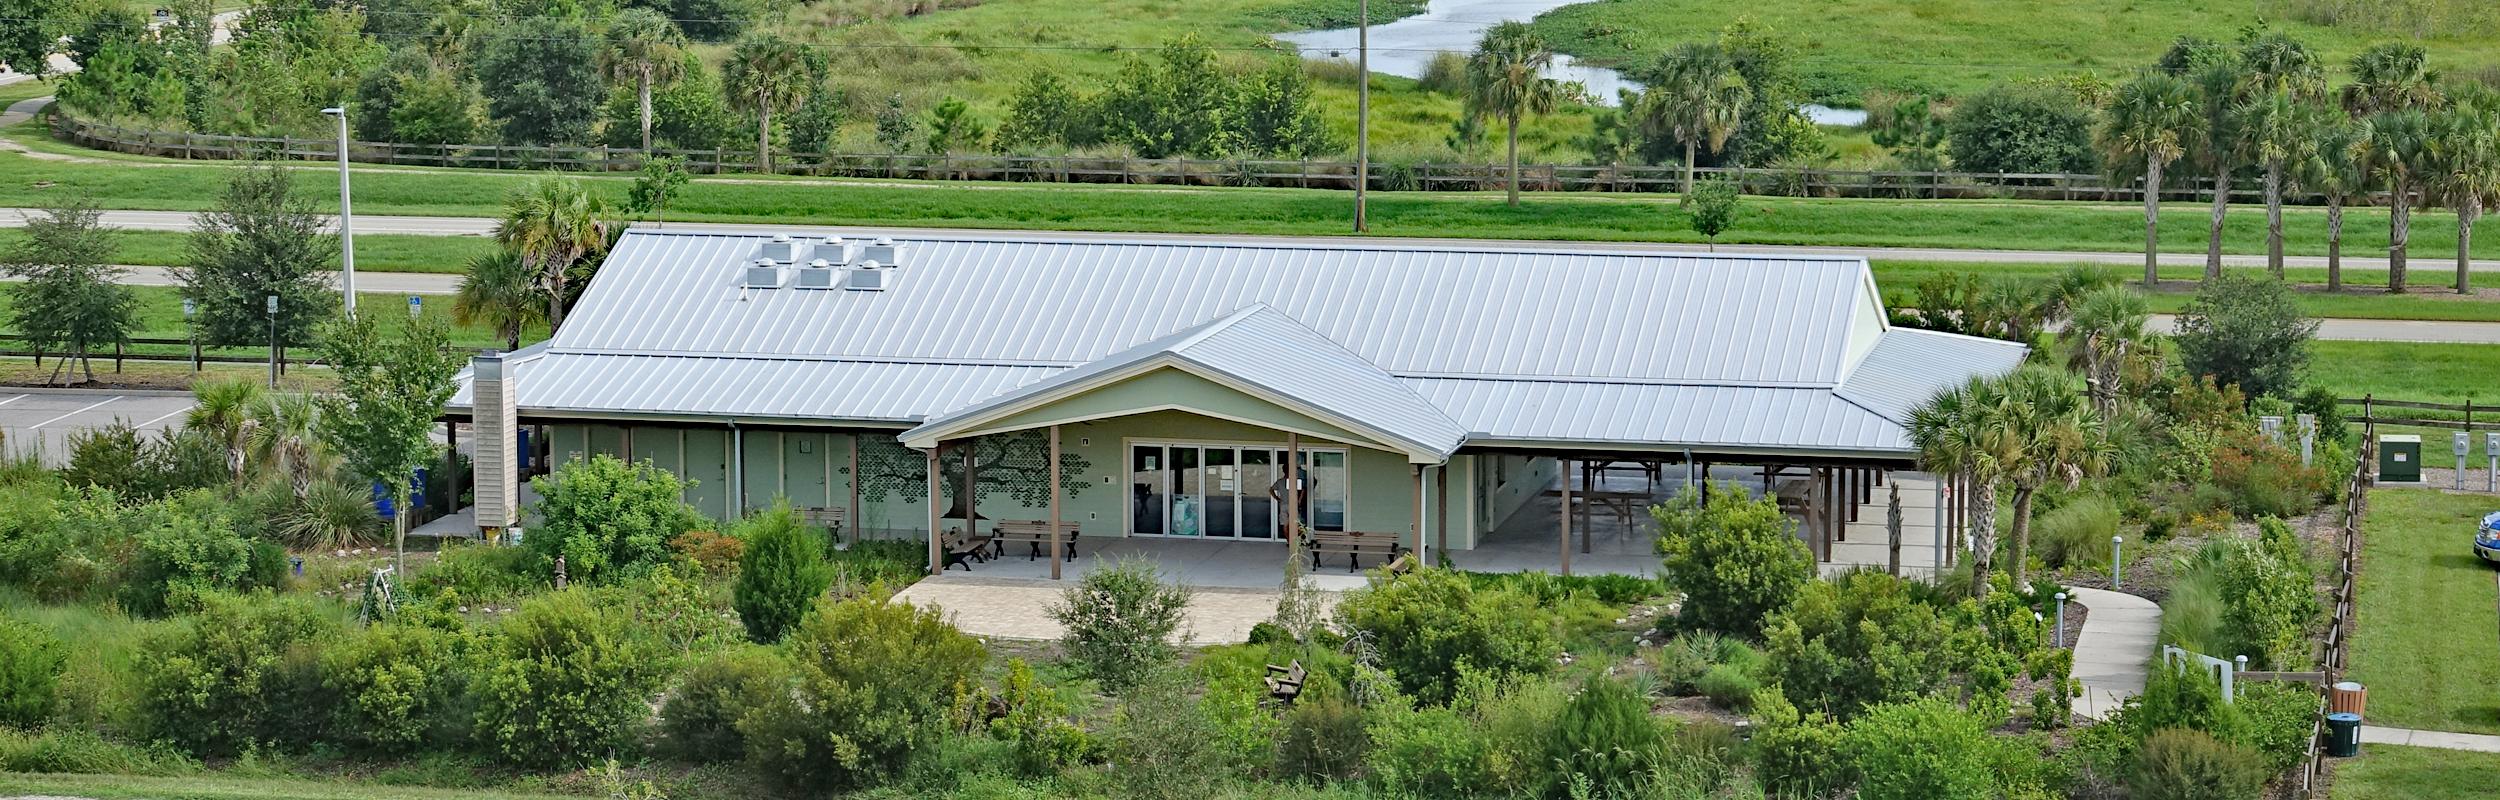 Nature center image